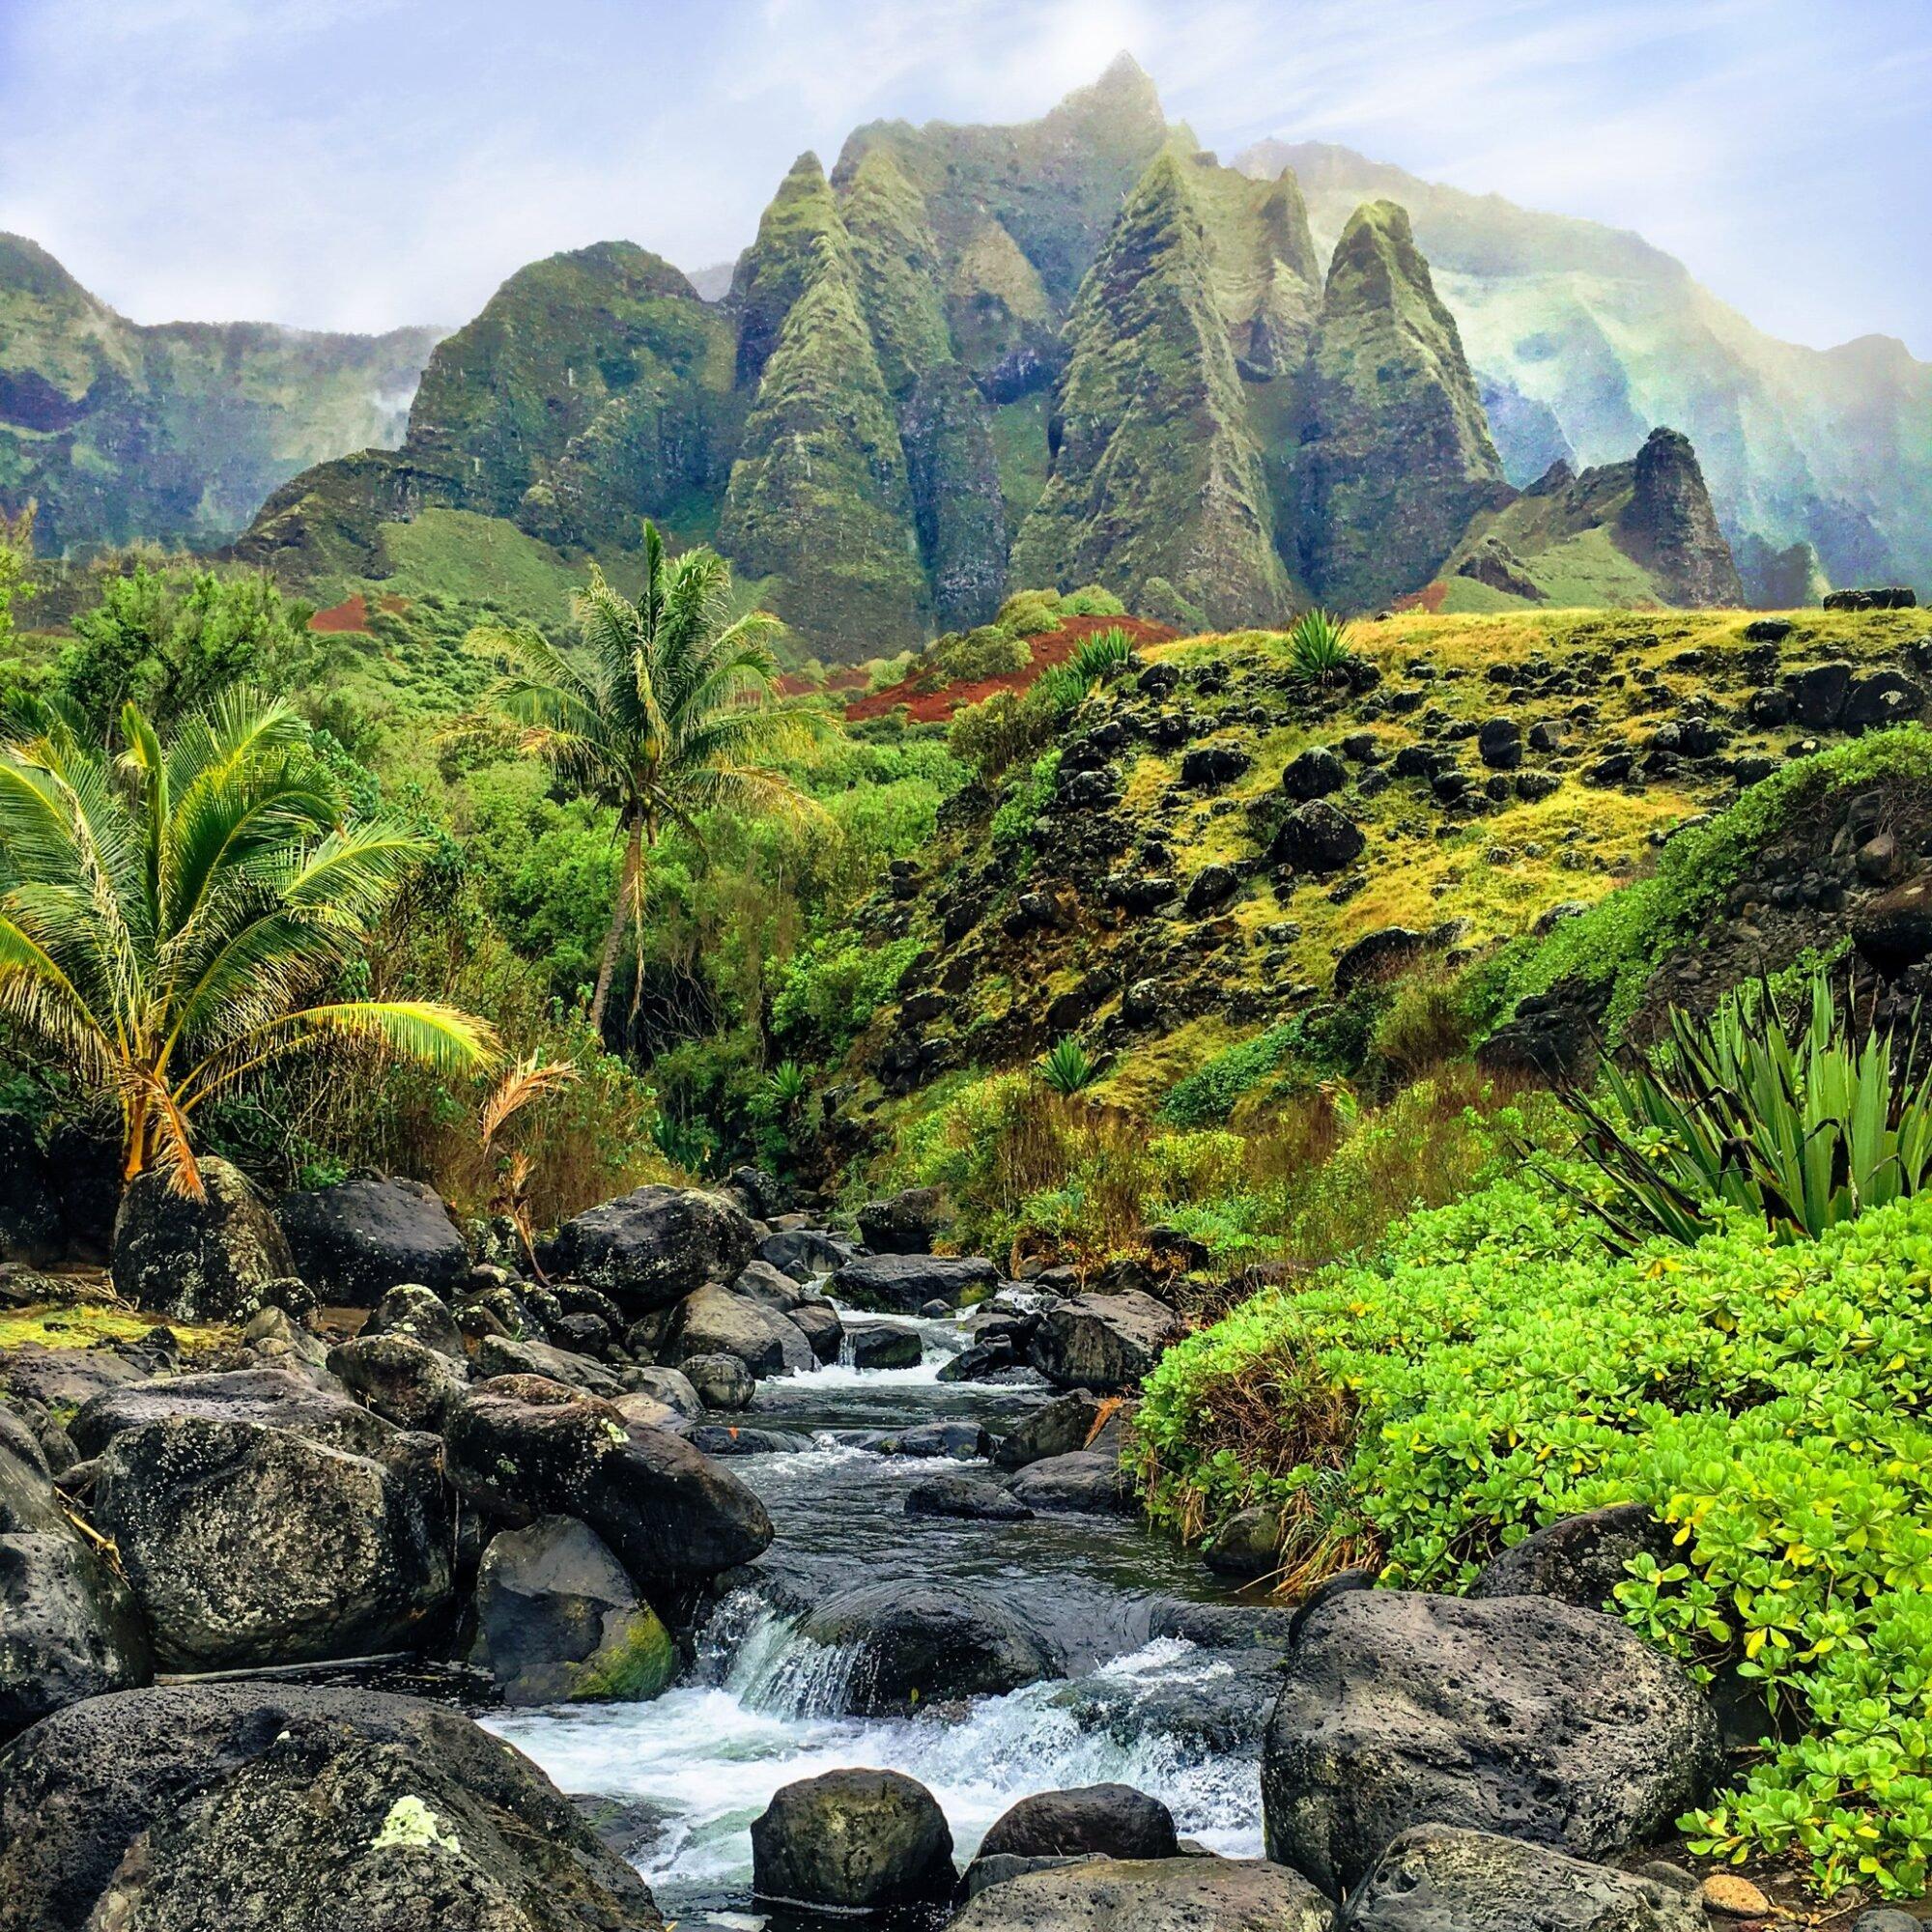 Beautiful landscape on the Napali Coast of Kauai, Hawaii.